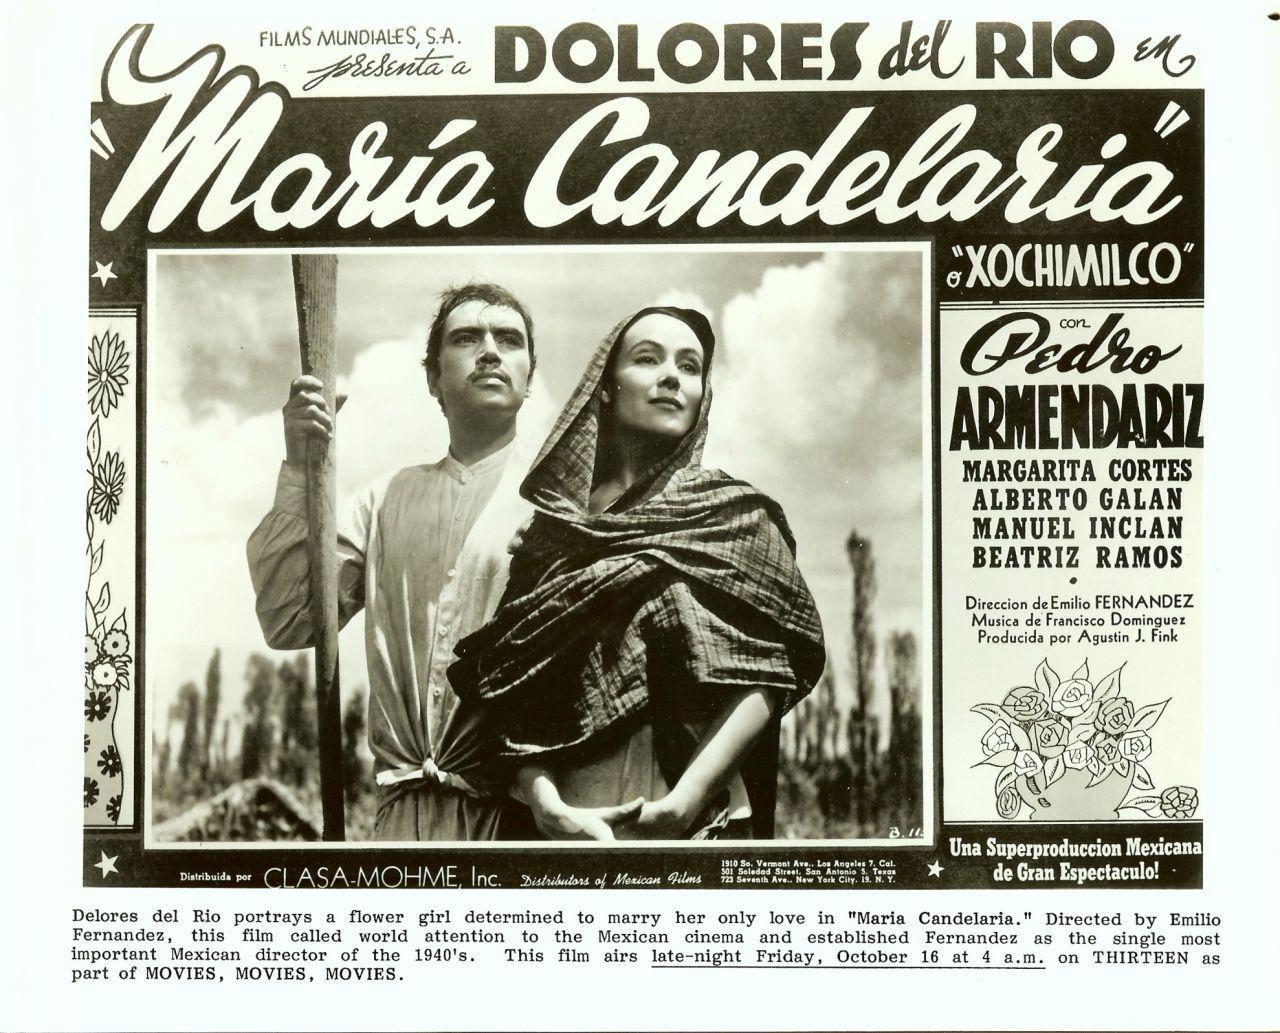 María Candelaria 1000 images about Fernndez Emilio 190486 Mara Candelaria